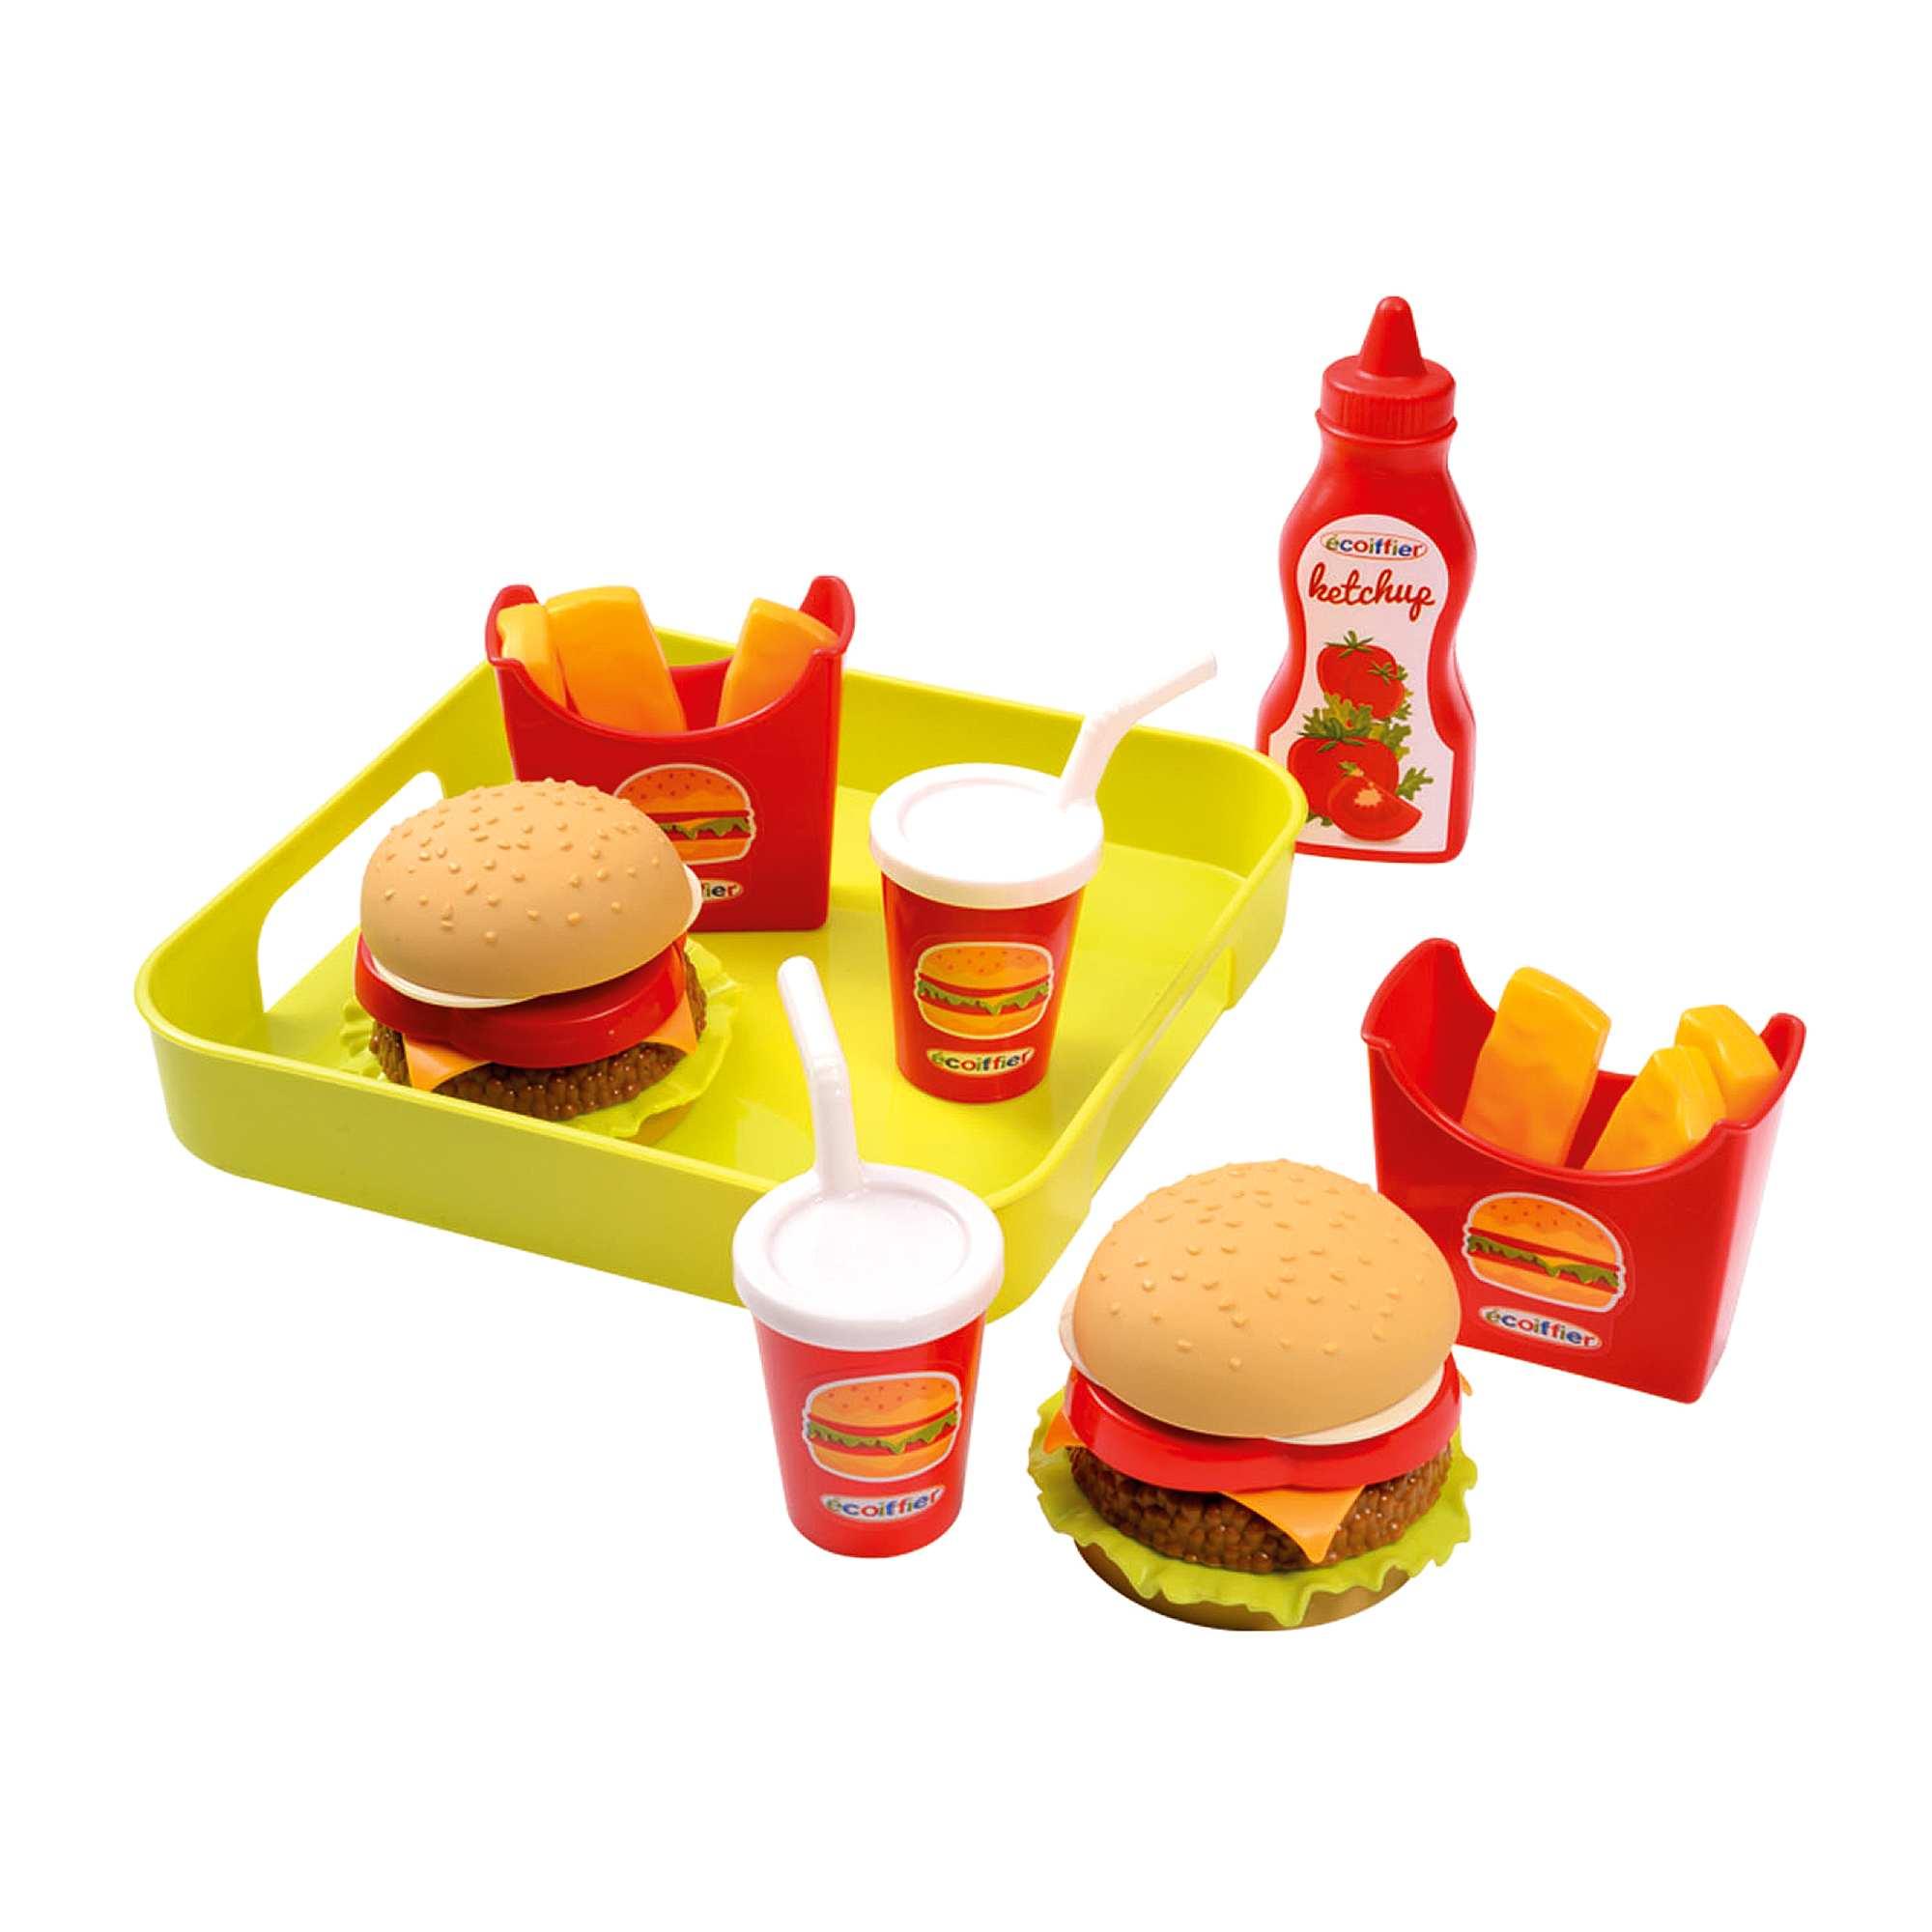 07295ca915 Jouet dînette fast-food Fille - multicolore - Kiabi - 9,00€